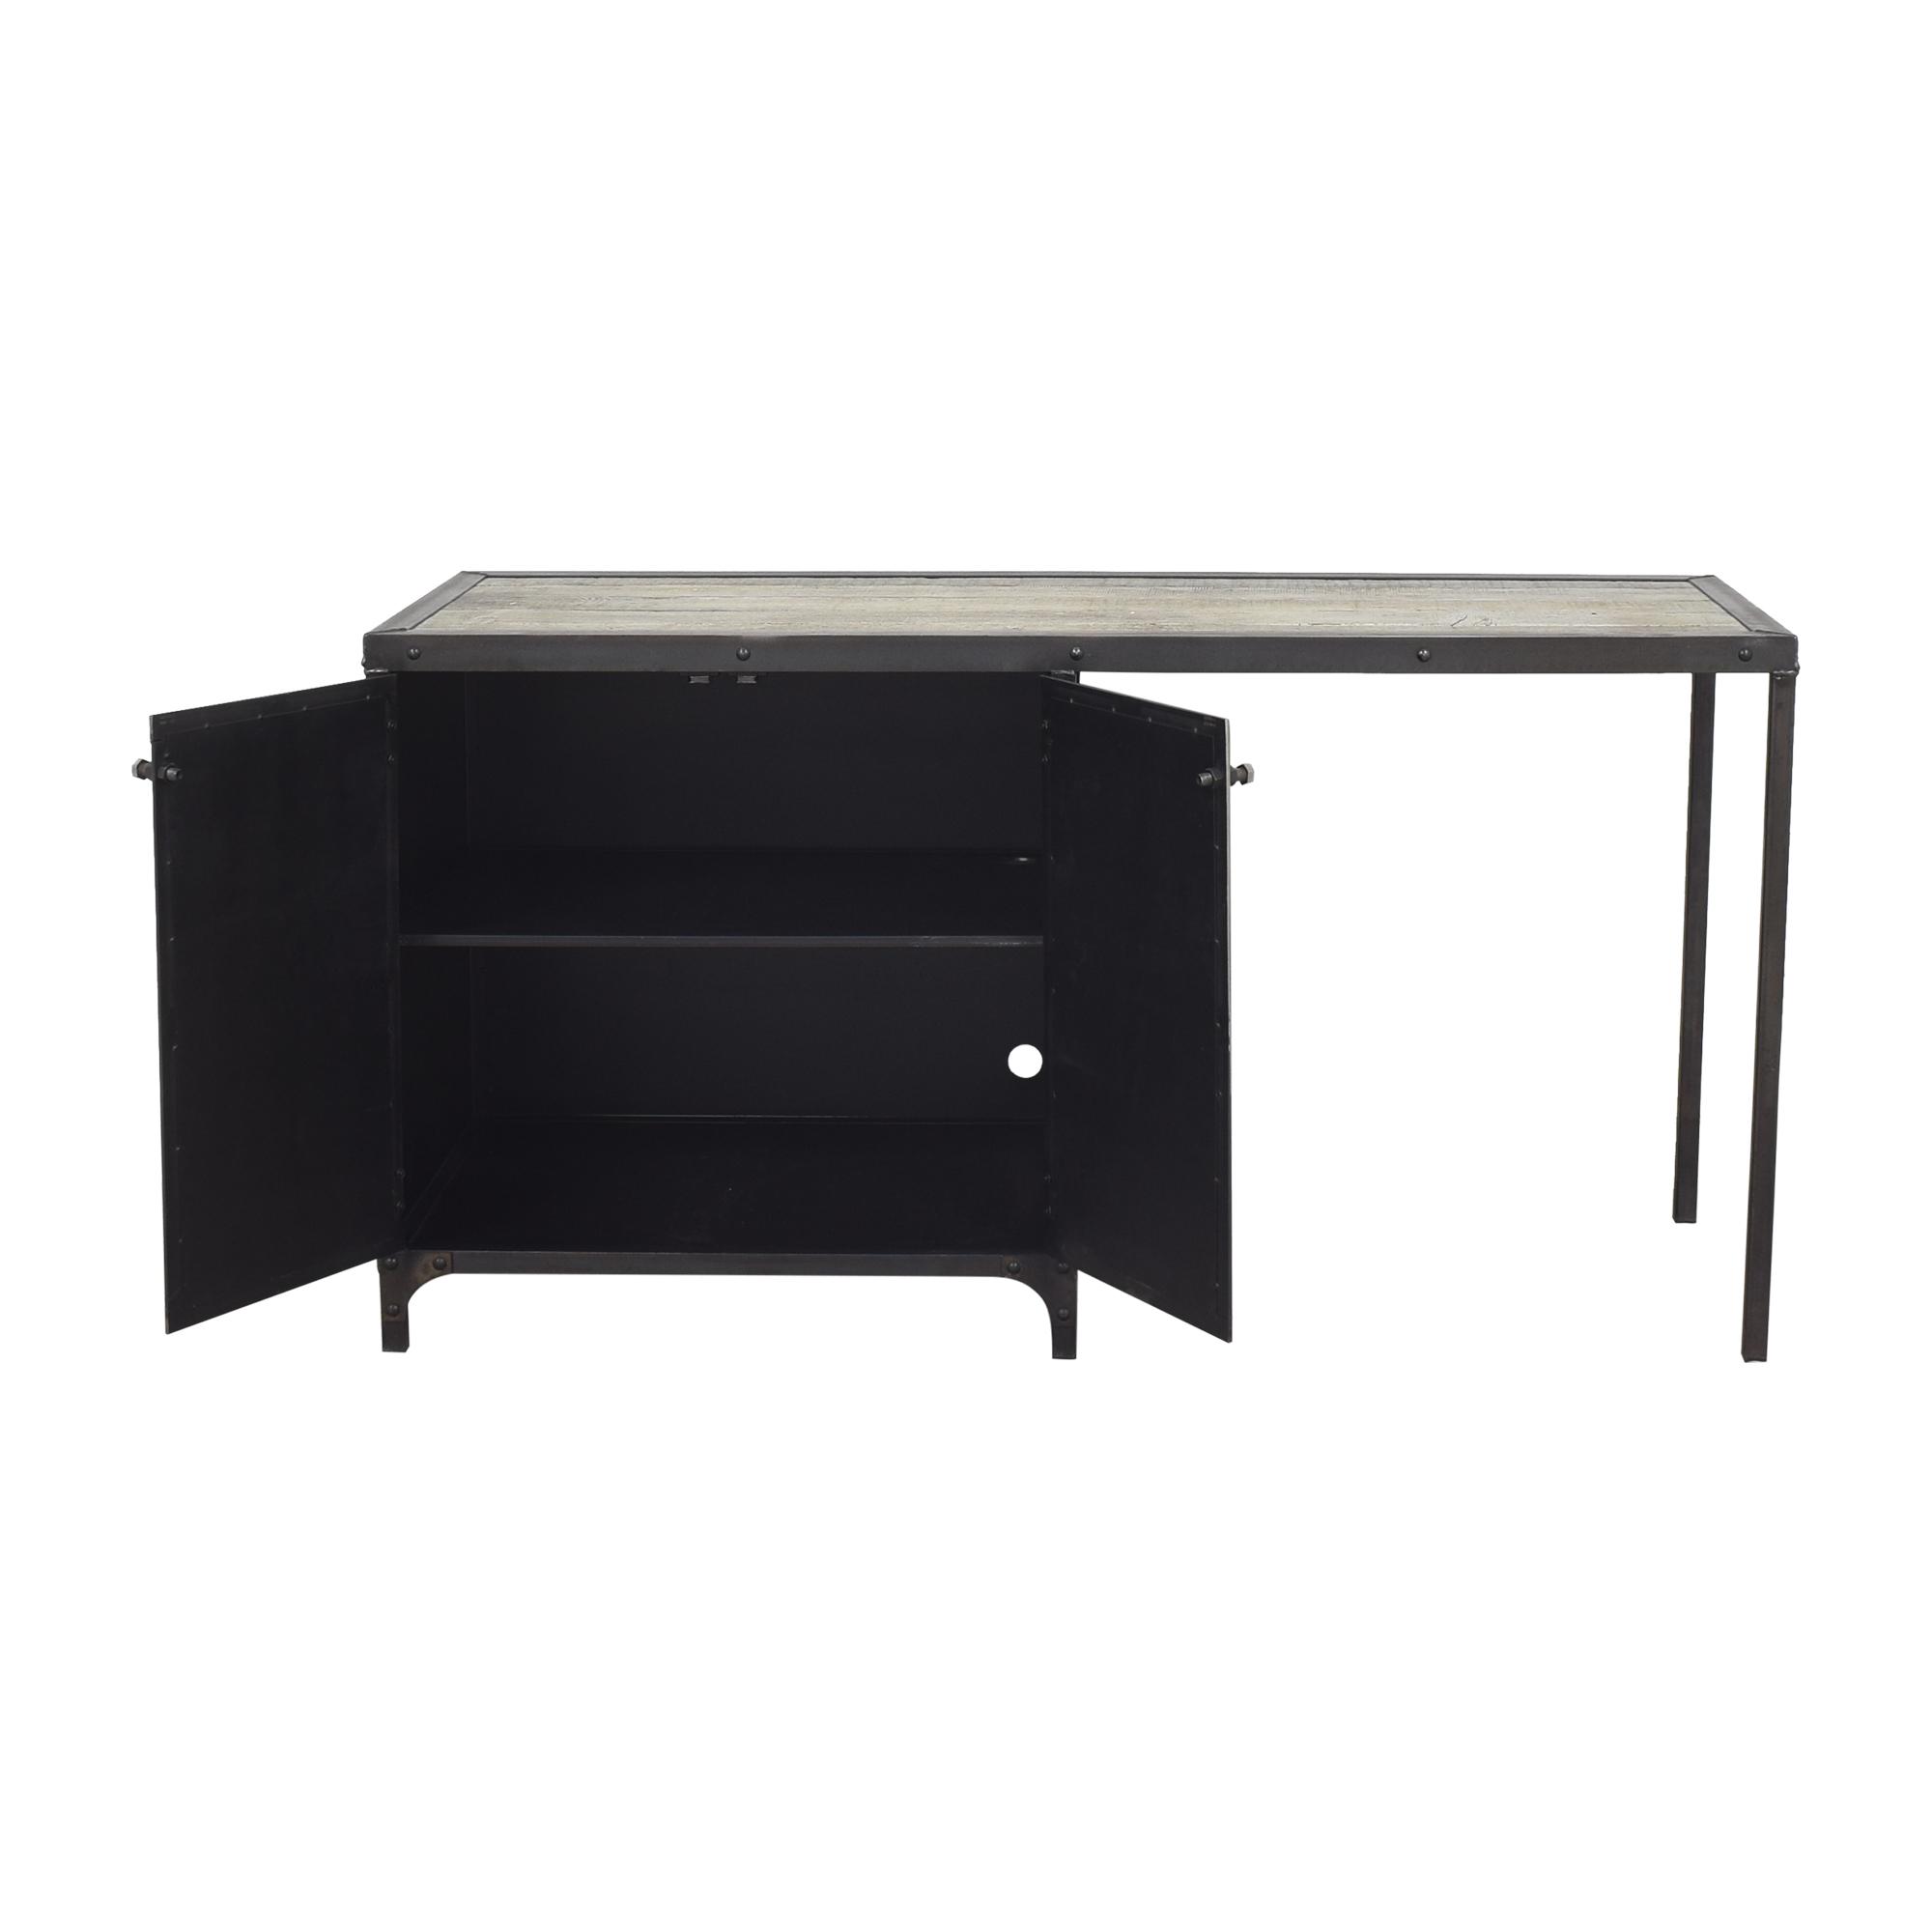 Combine 9 Industrial Desk with Side Cabinet Storage sale